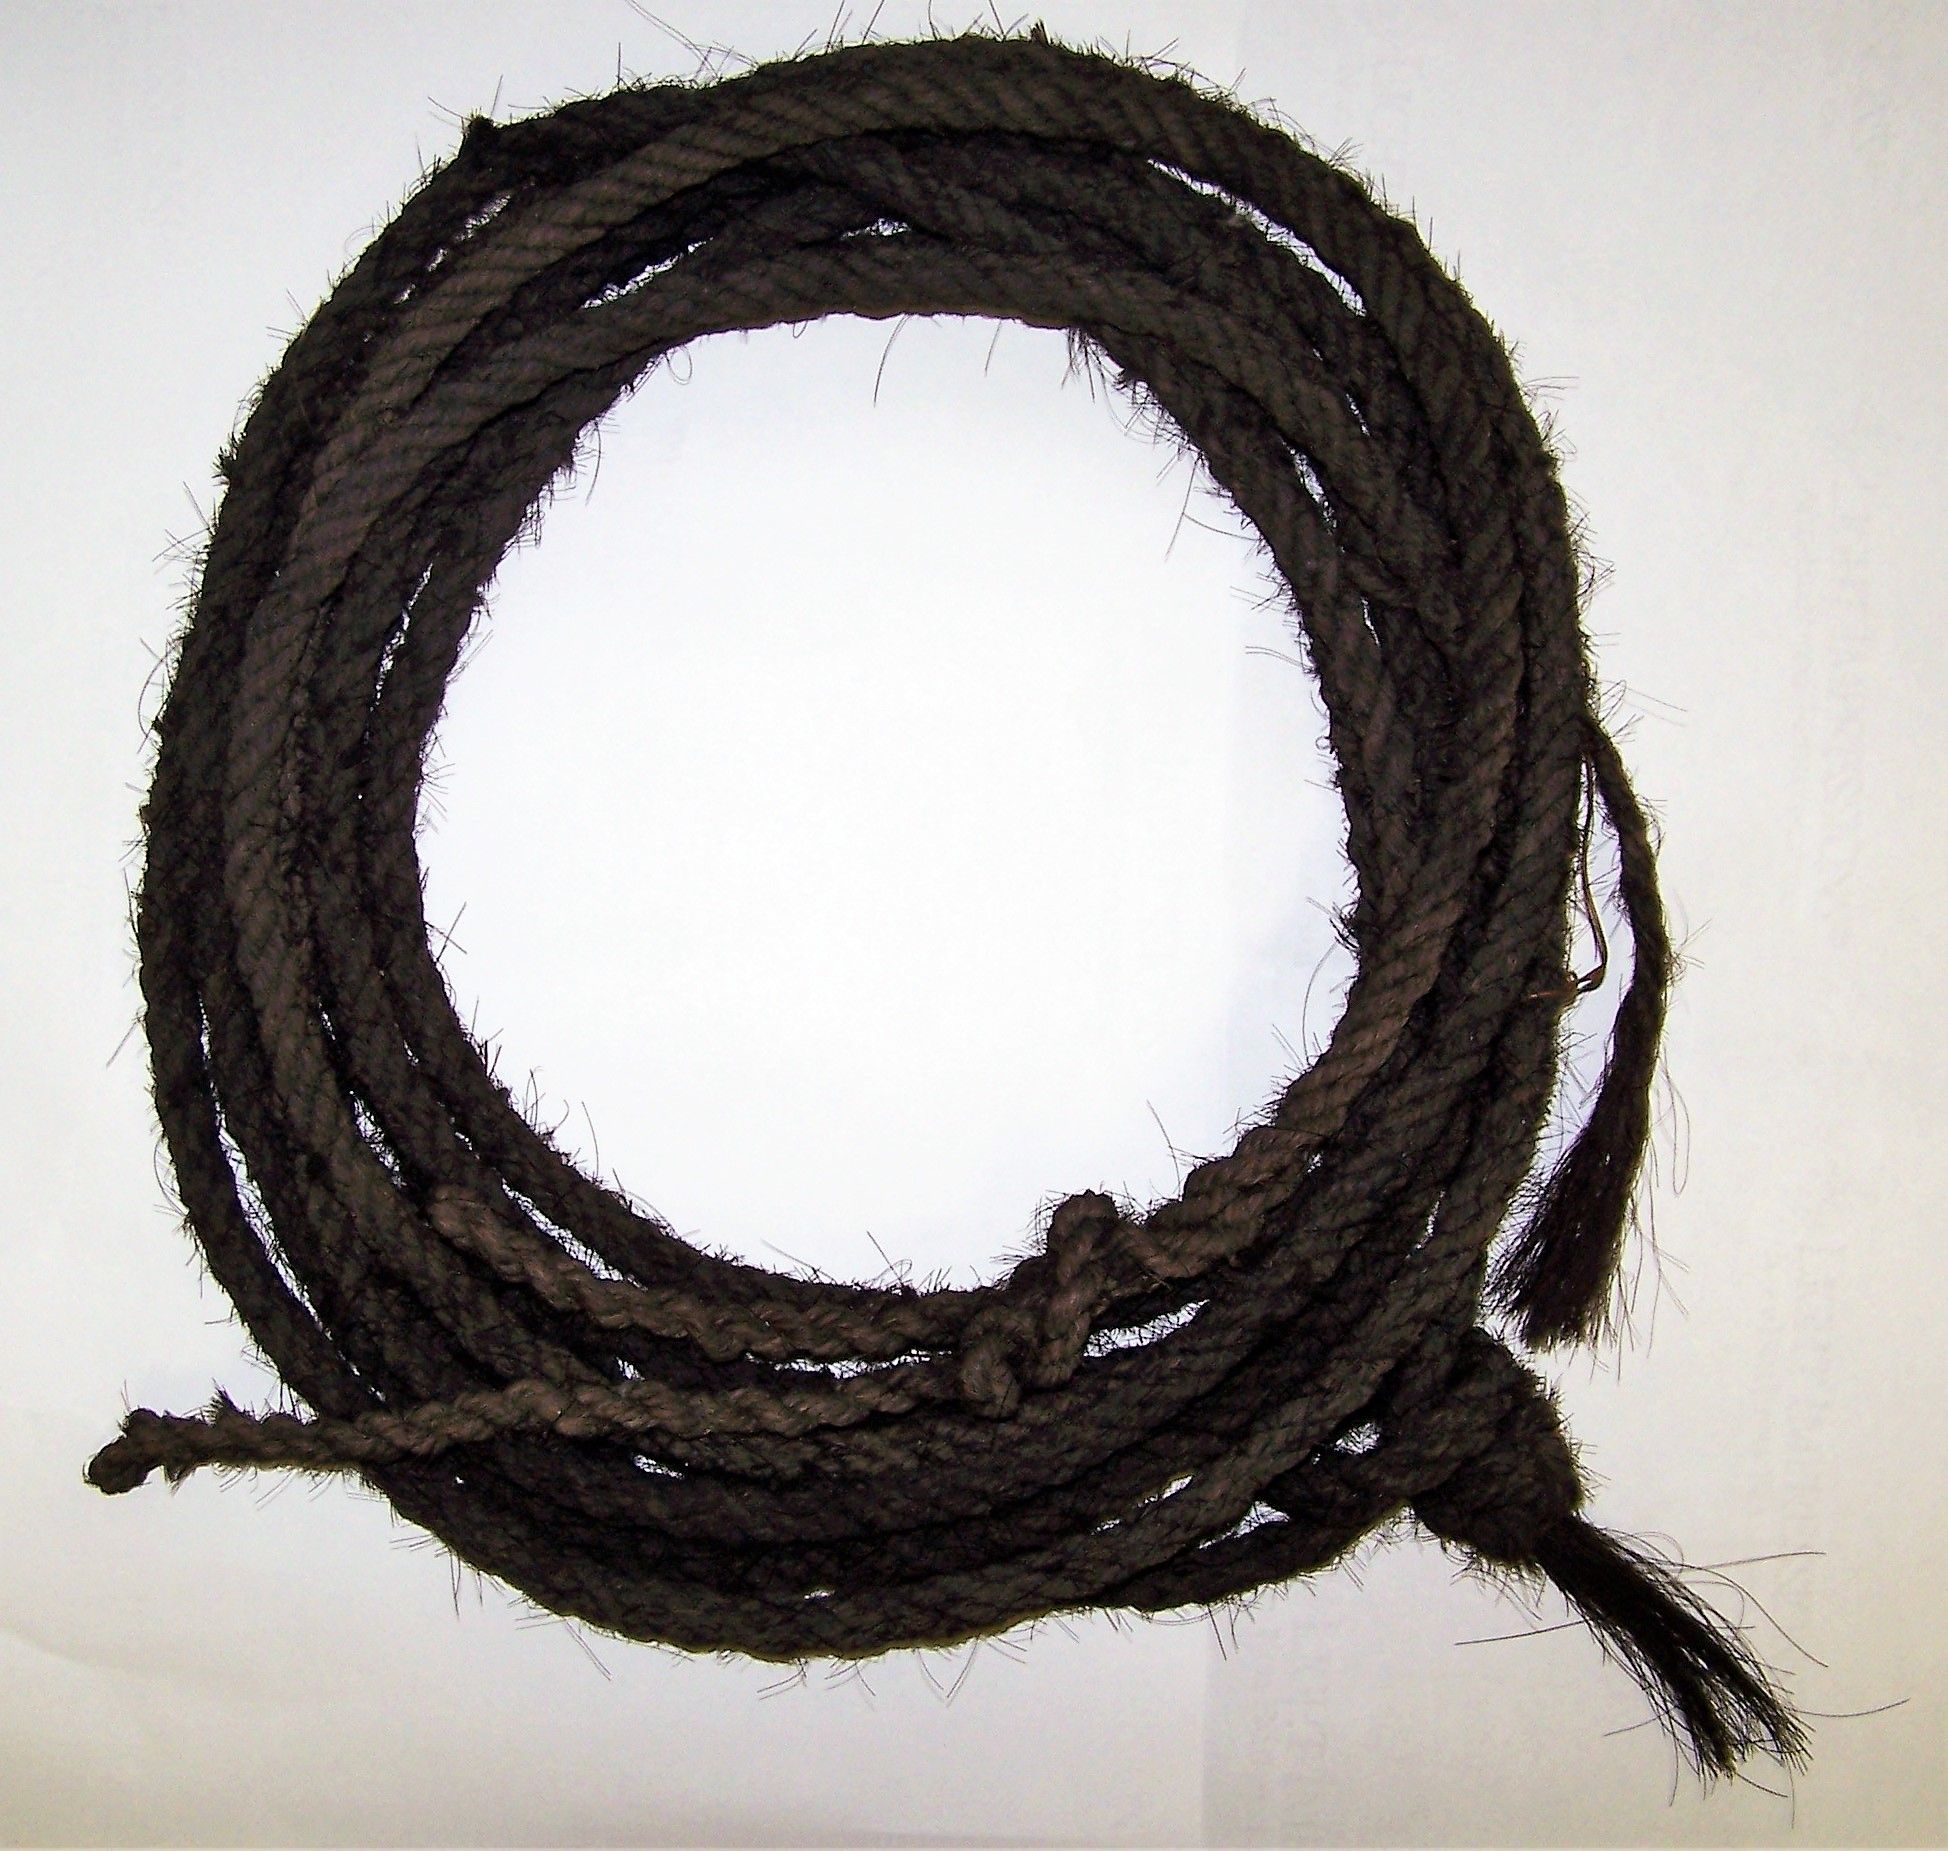 Native American ropes